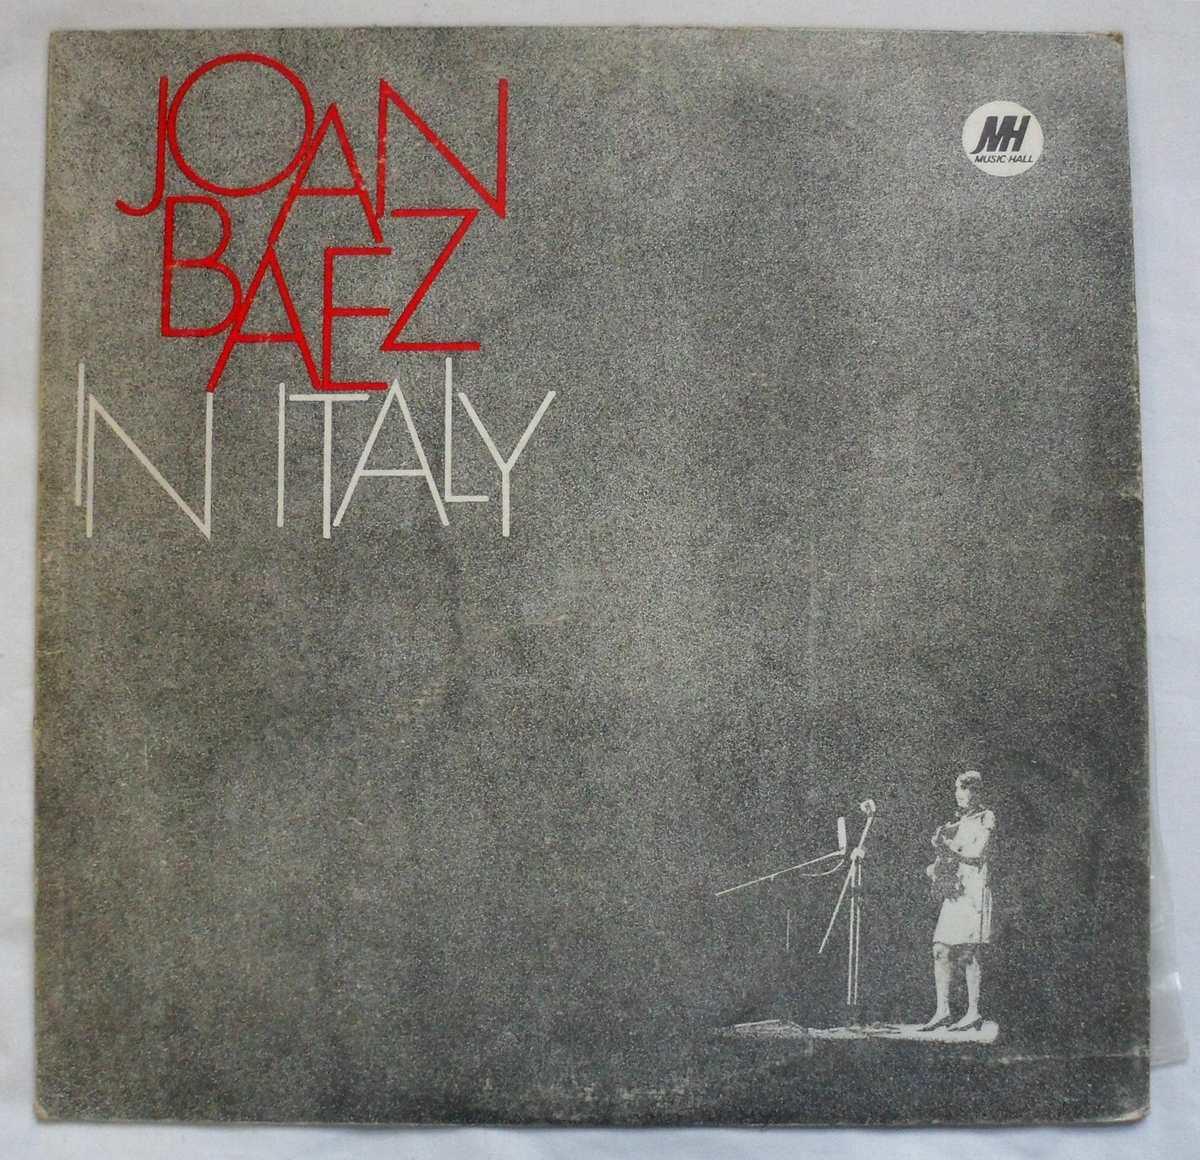 Joan Baez Heres To You